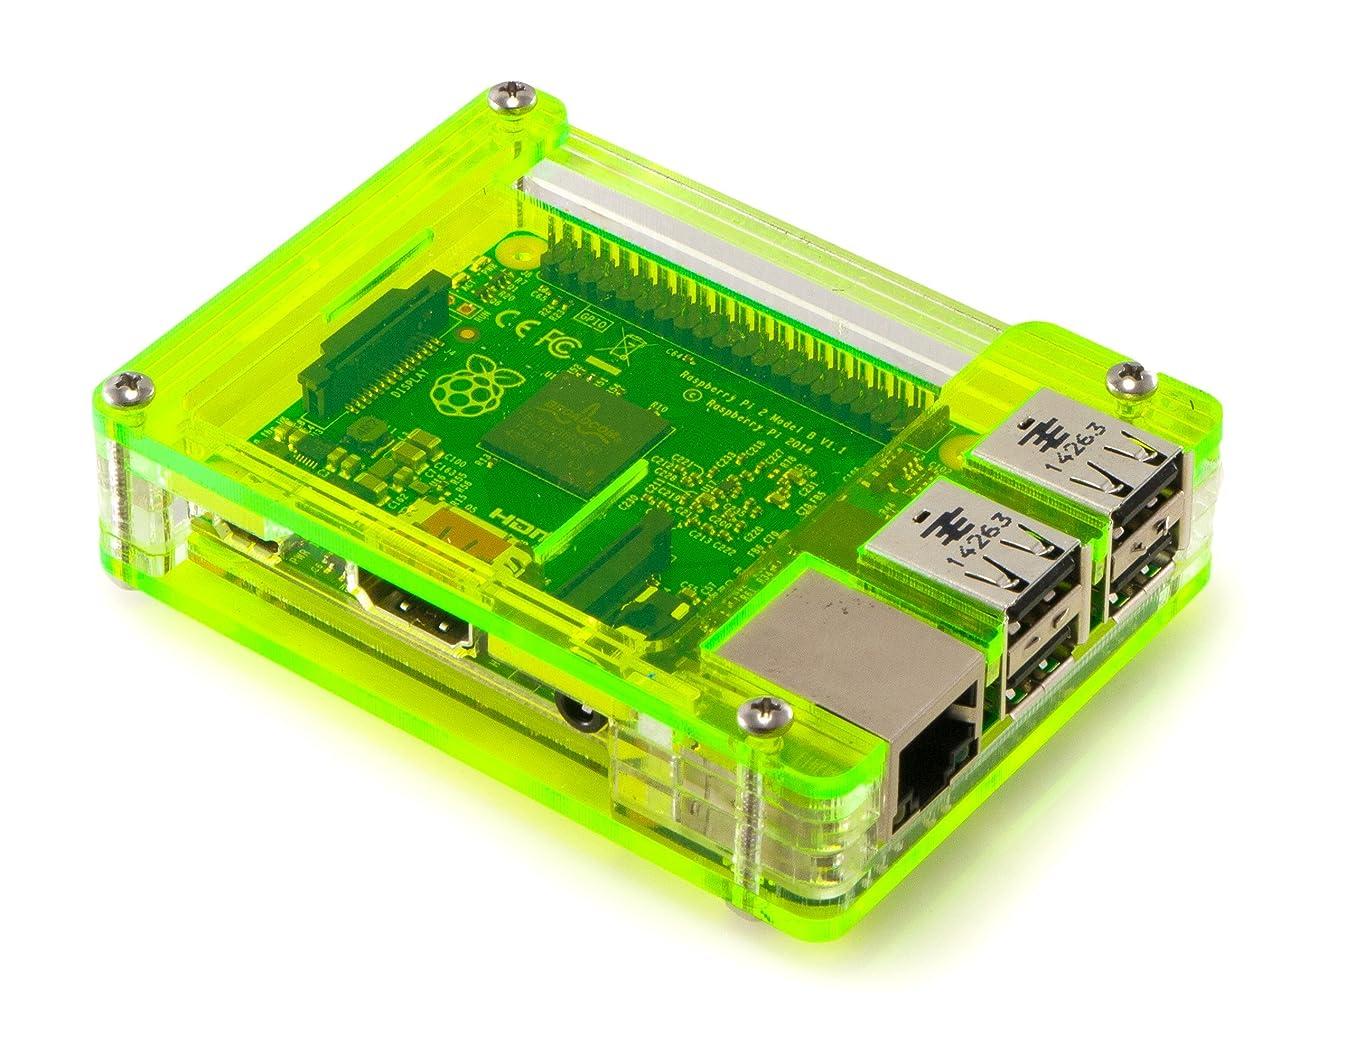 C4 Labs Zebra Case - Raspberry Pi 3, Pi 2, Pi B+ and 2B (Lazer Lime) with Heatsinks ~ C4Labs